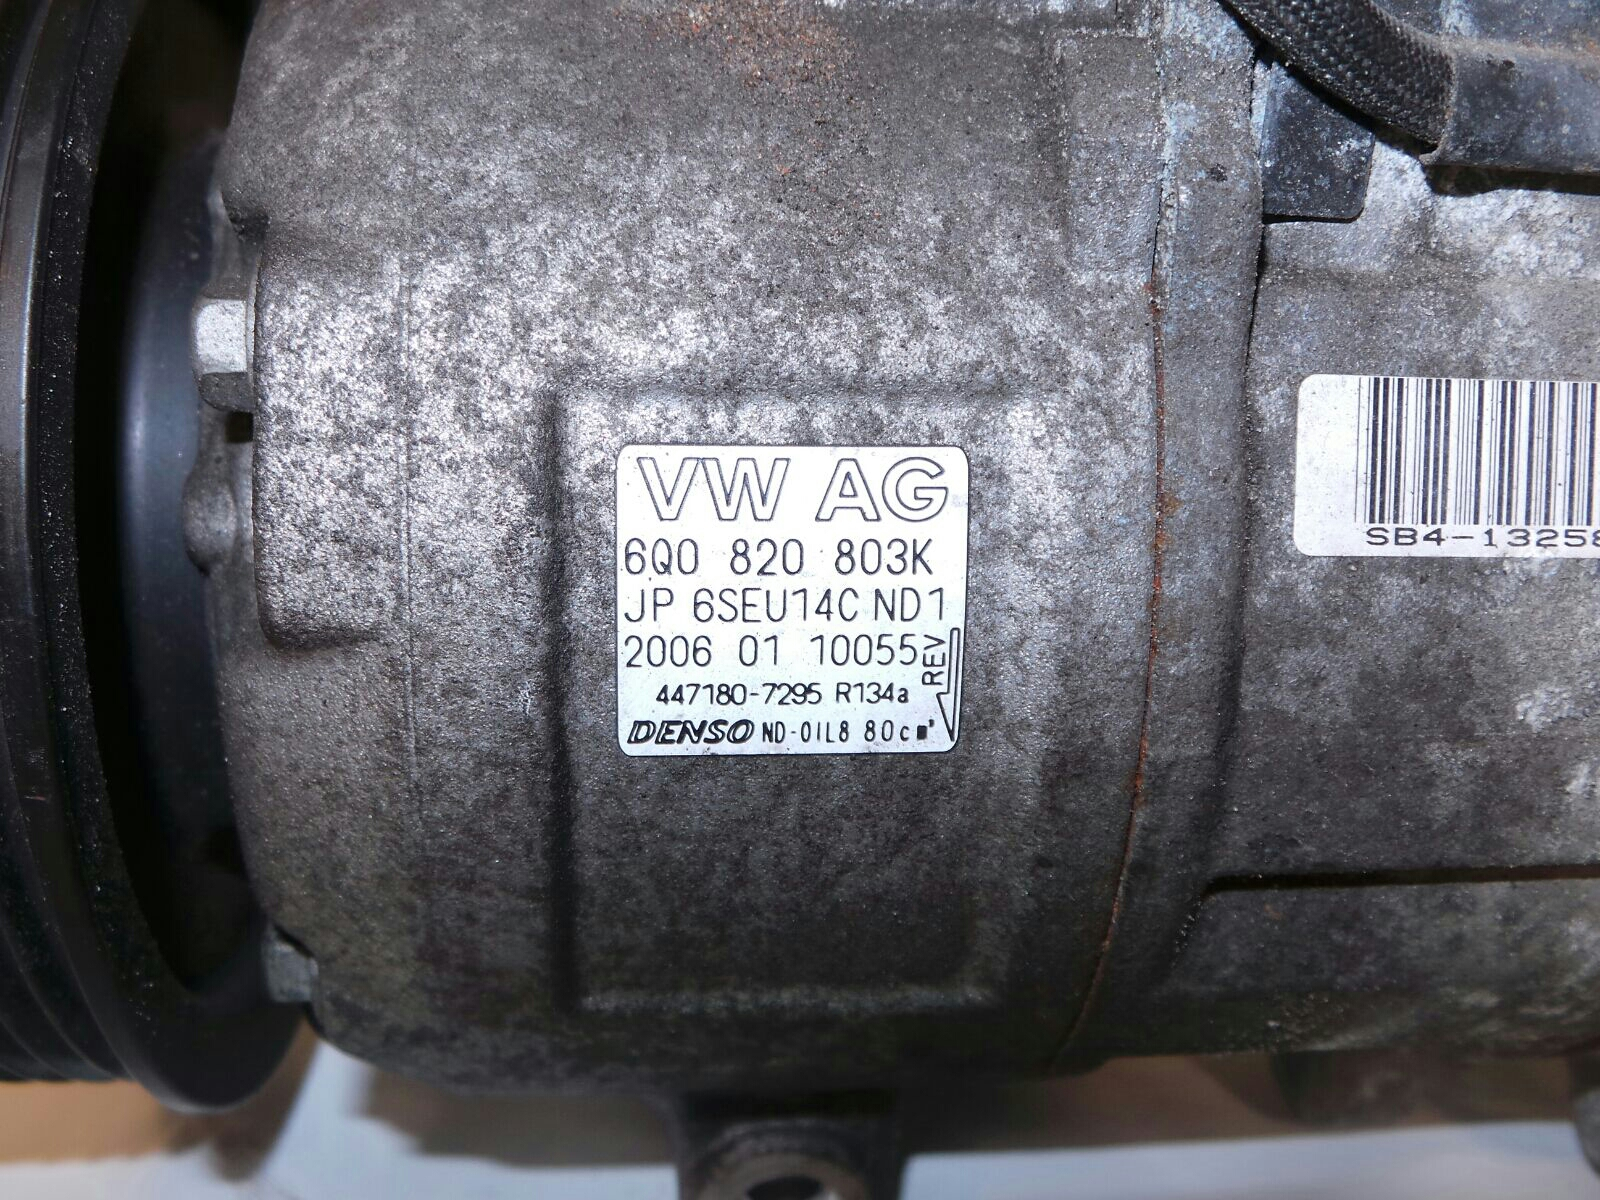 Volkswagen Polo 2005 To 2009 Air Conditioning Compressor Petrol Kompresor Vw Denso Ac Con 6q0820803k 5081937